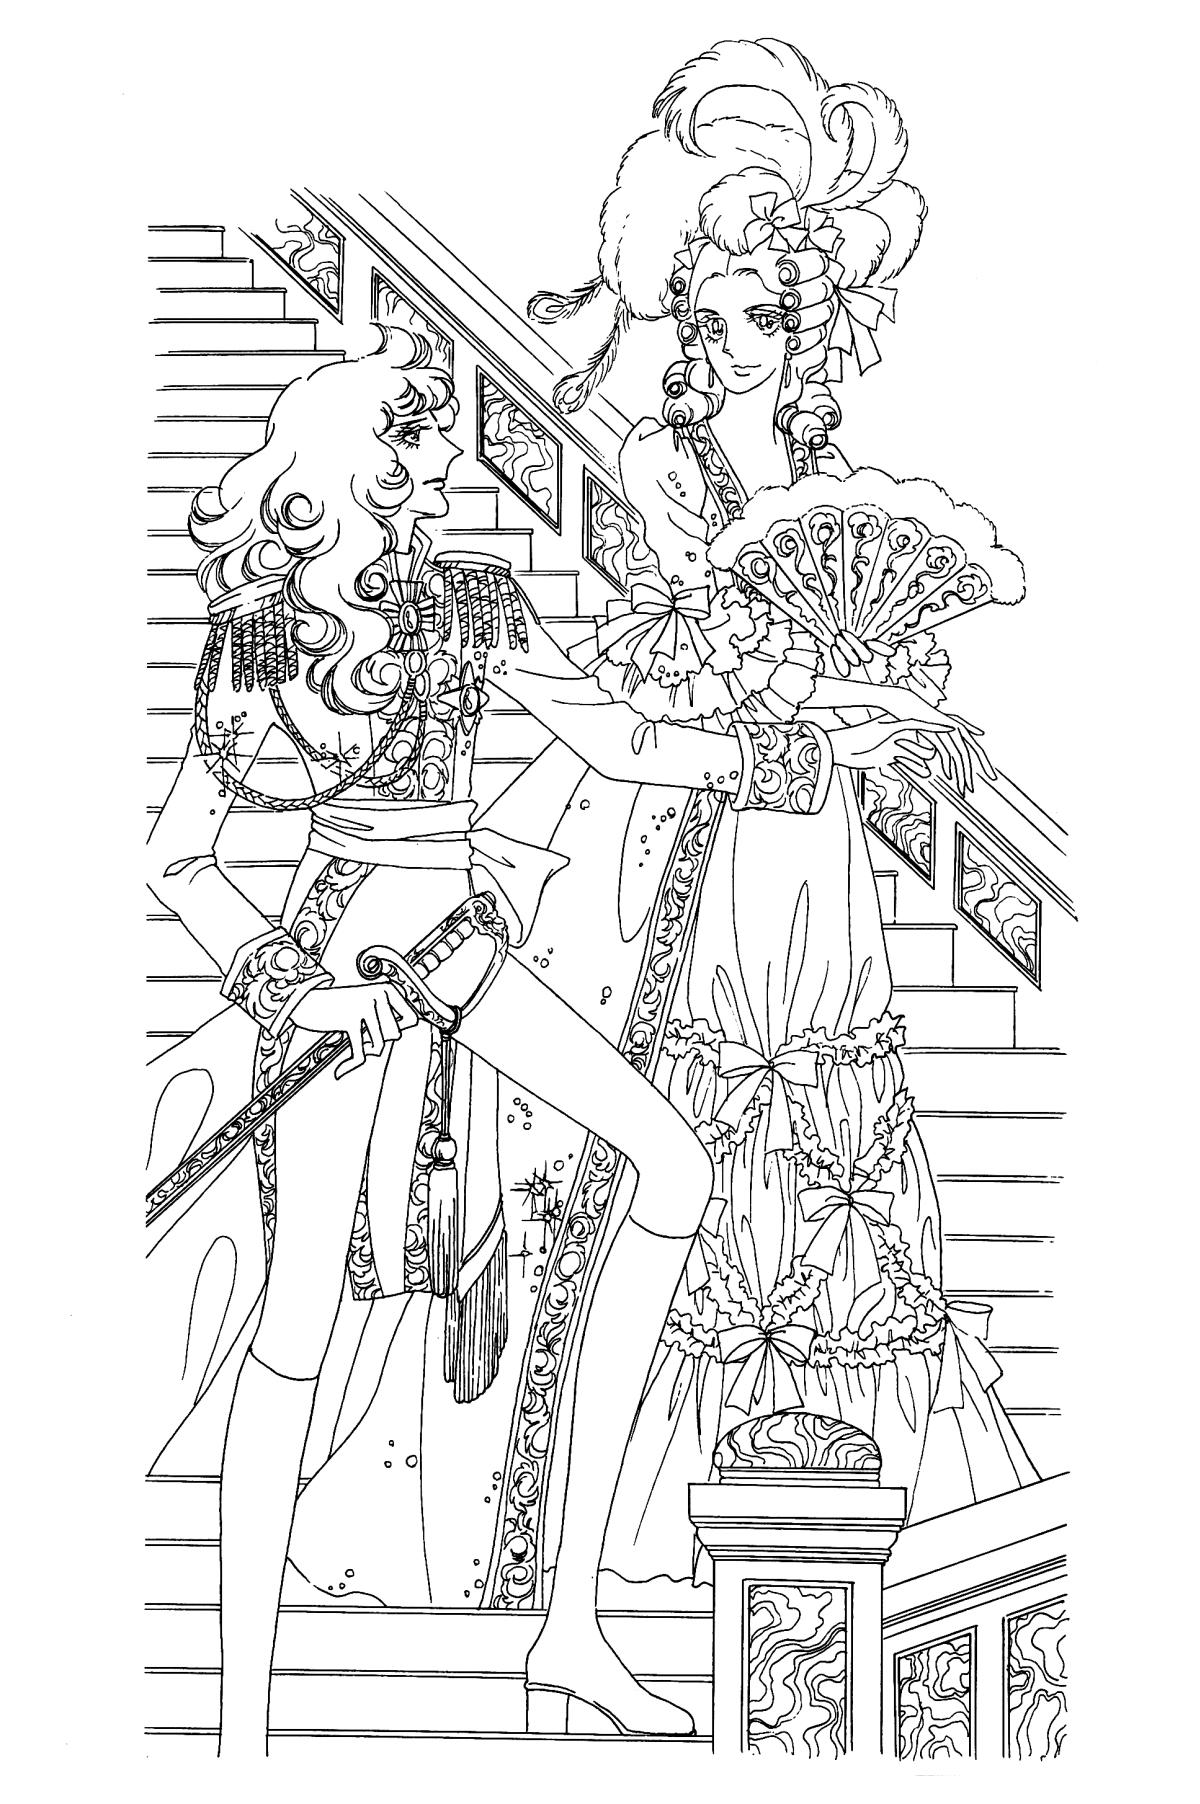 Immagini da colorare di lady oscar topmanga anime - Immagini di colorare le pagine del libro da colorare ...